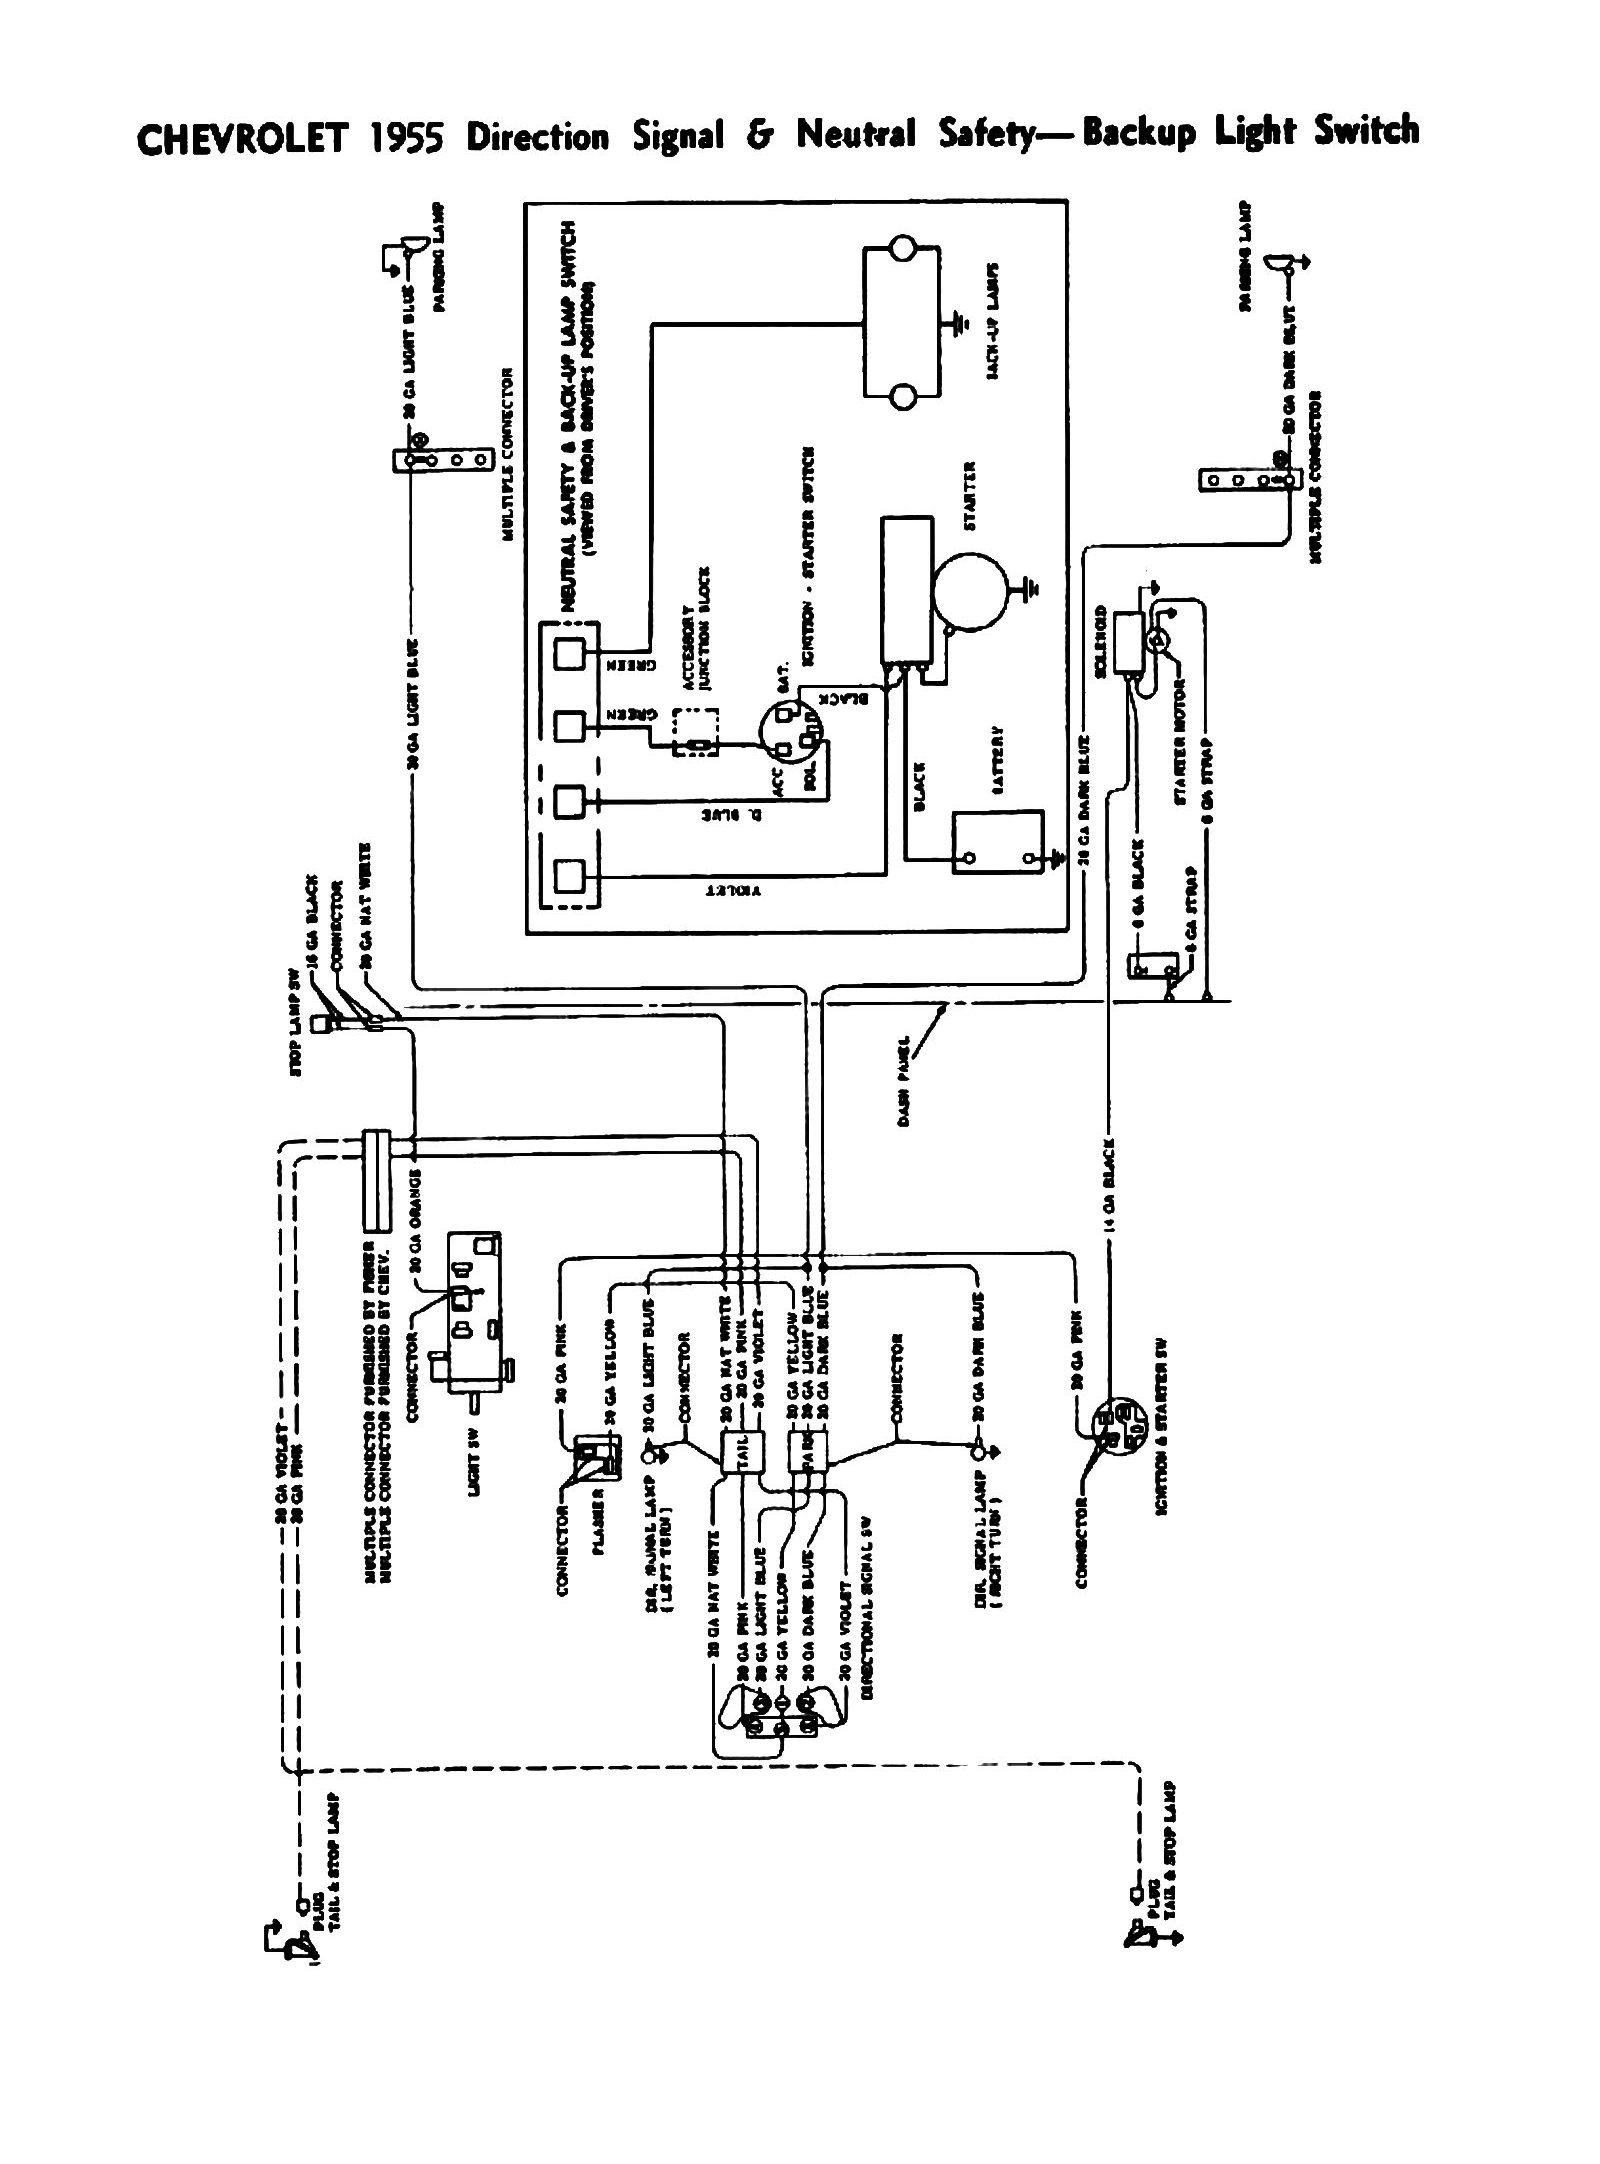 Chevy Truck Wiring Diagram 1957 Chevy Heater Wiring Diagram Wiring Diagrams Of Chevy Truck Wiring Diagram